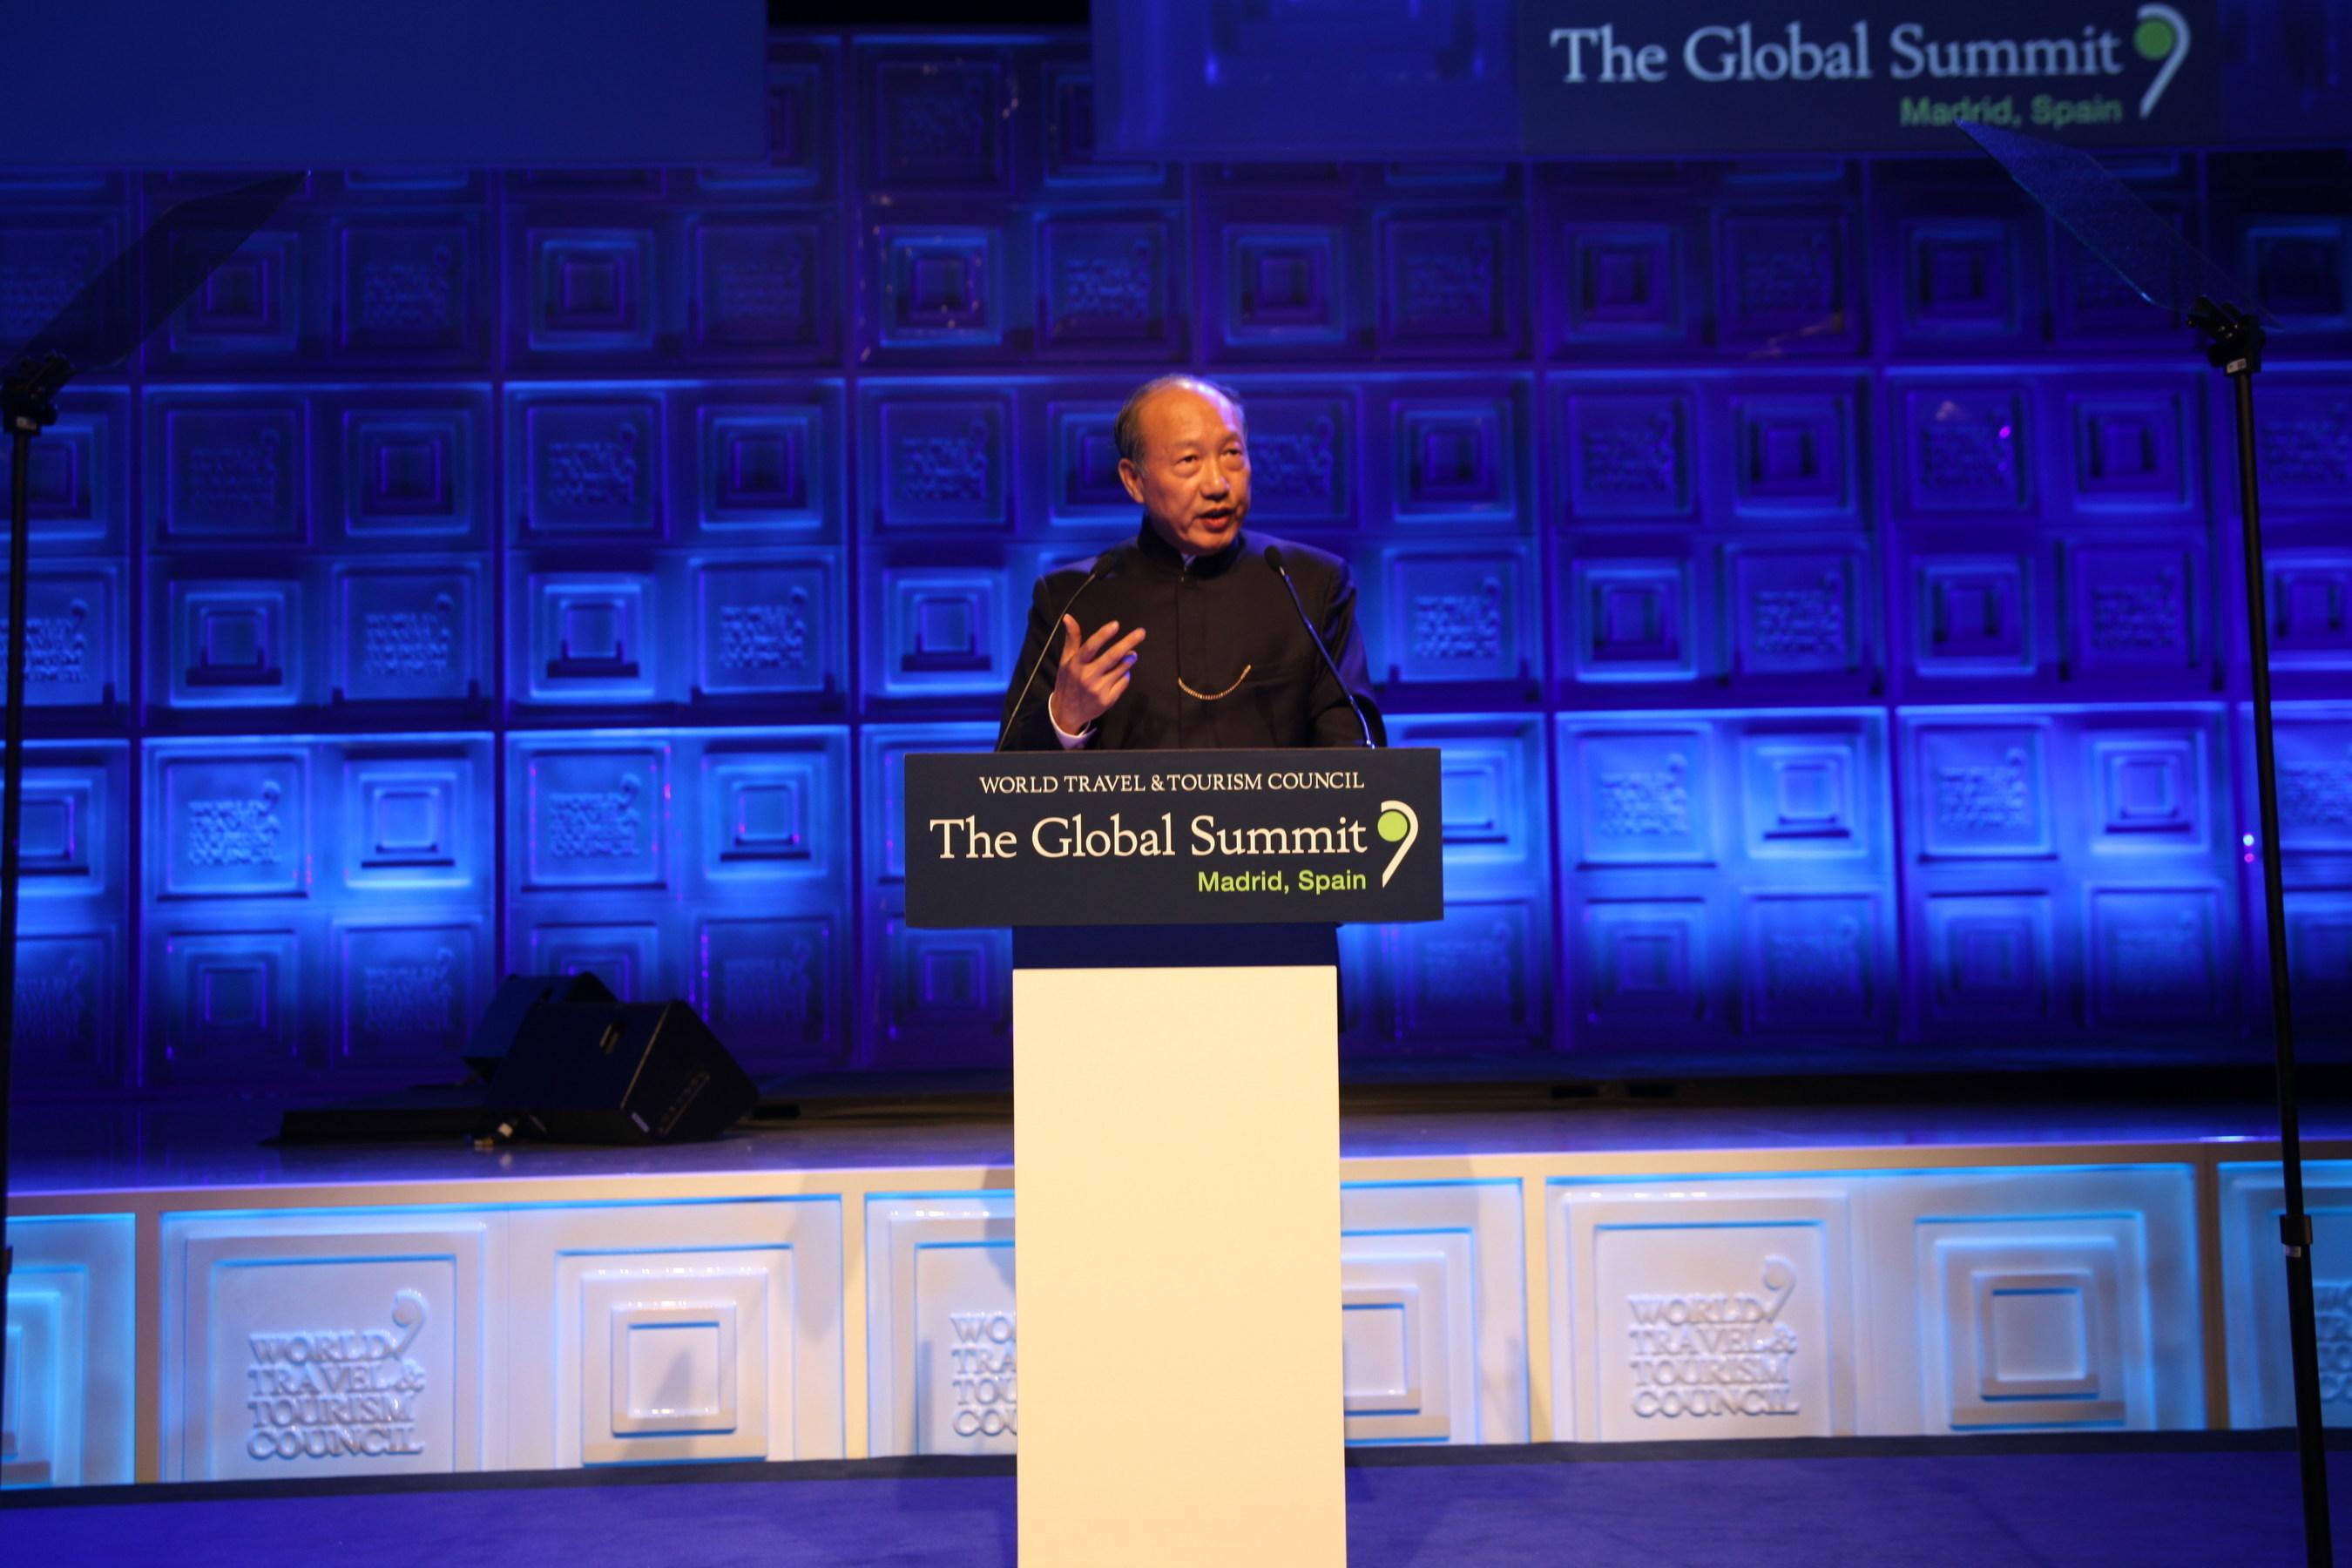 El presidente de HNA Group, Chen Feng, da el discurso de la 2015 WTTC Global Summit